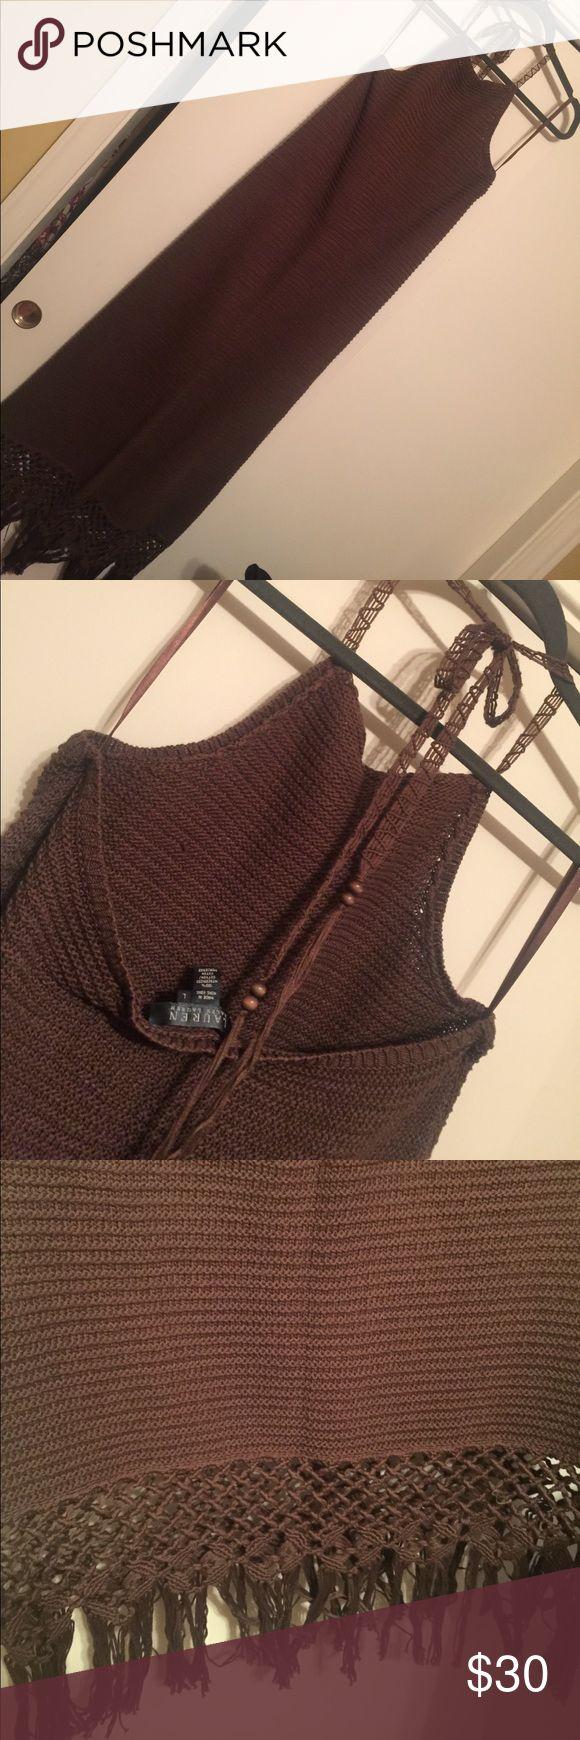 Ralph Lauren  Crochet Halter Maxi Dress Chocolate brown crochet maxi dress with fringe detail at hem, beading at end of ties. Worn once. Lauren Ralph Lauren Dresses Maxi